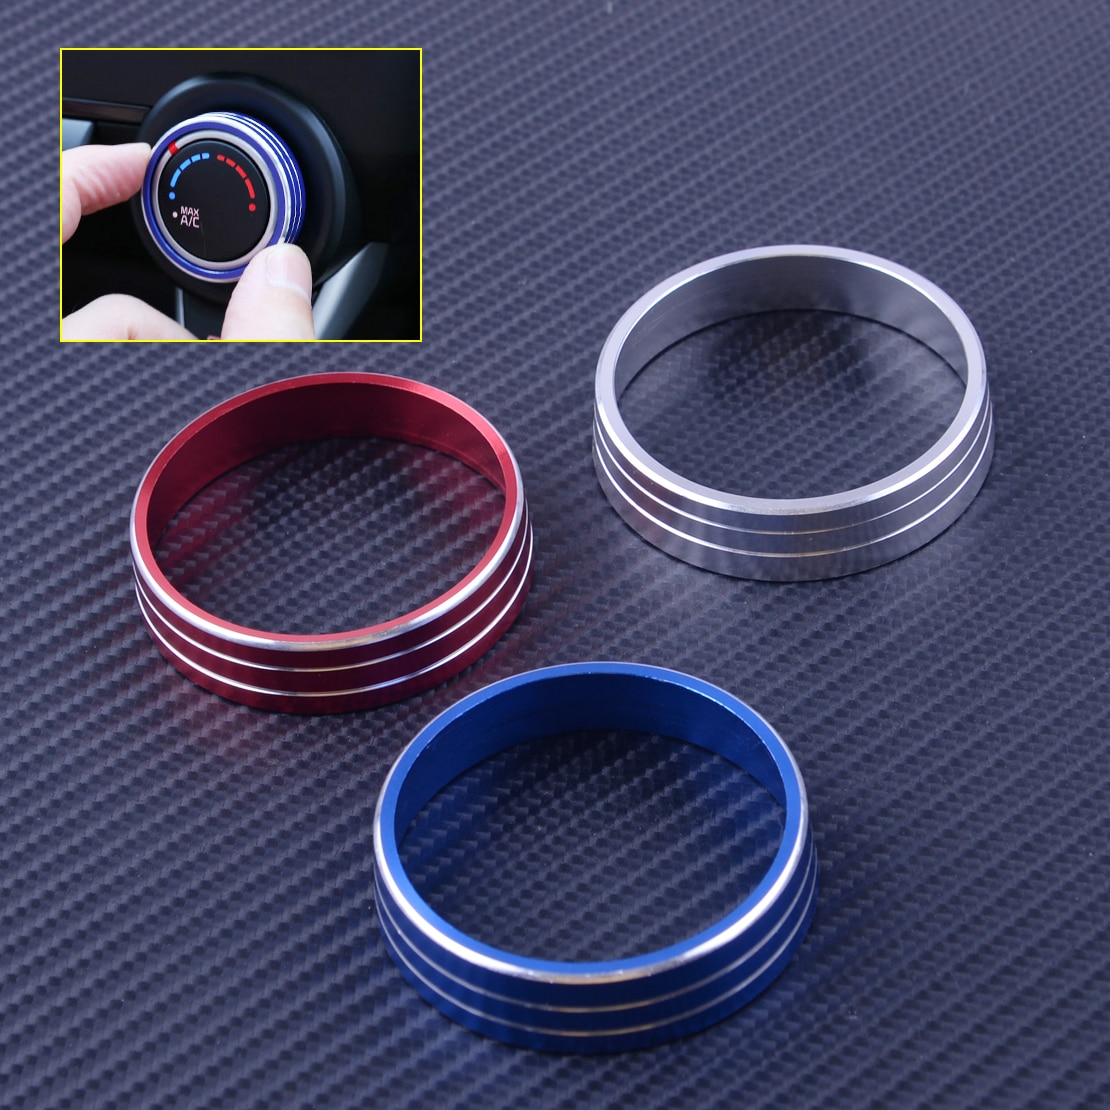 Cigall Car A/C calentador interruptor de control de aire acondicionado Panel botones tapa de perillas anillo de ajuste adecuado para Mitsubishi Lancer Outlander Accesorios